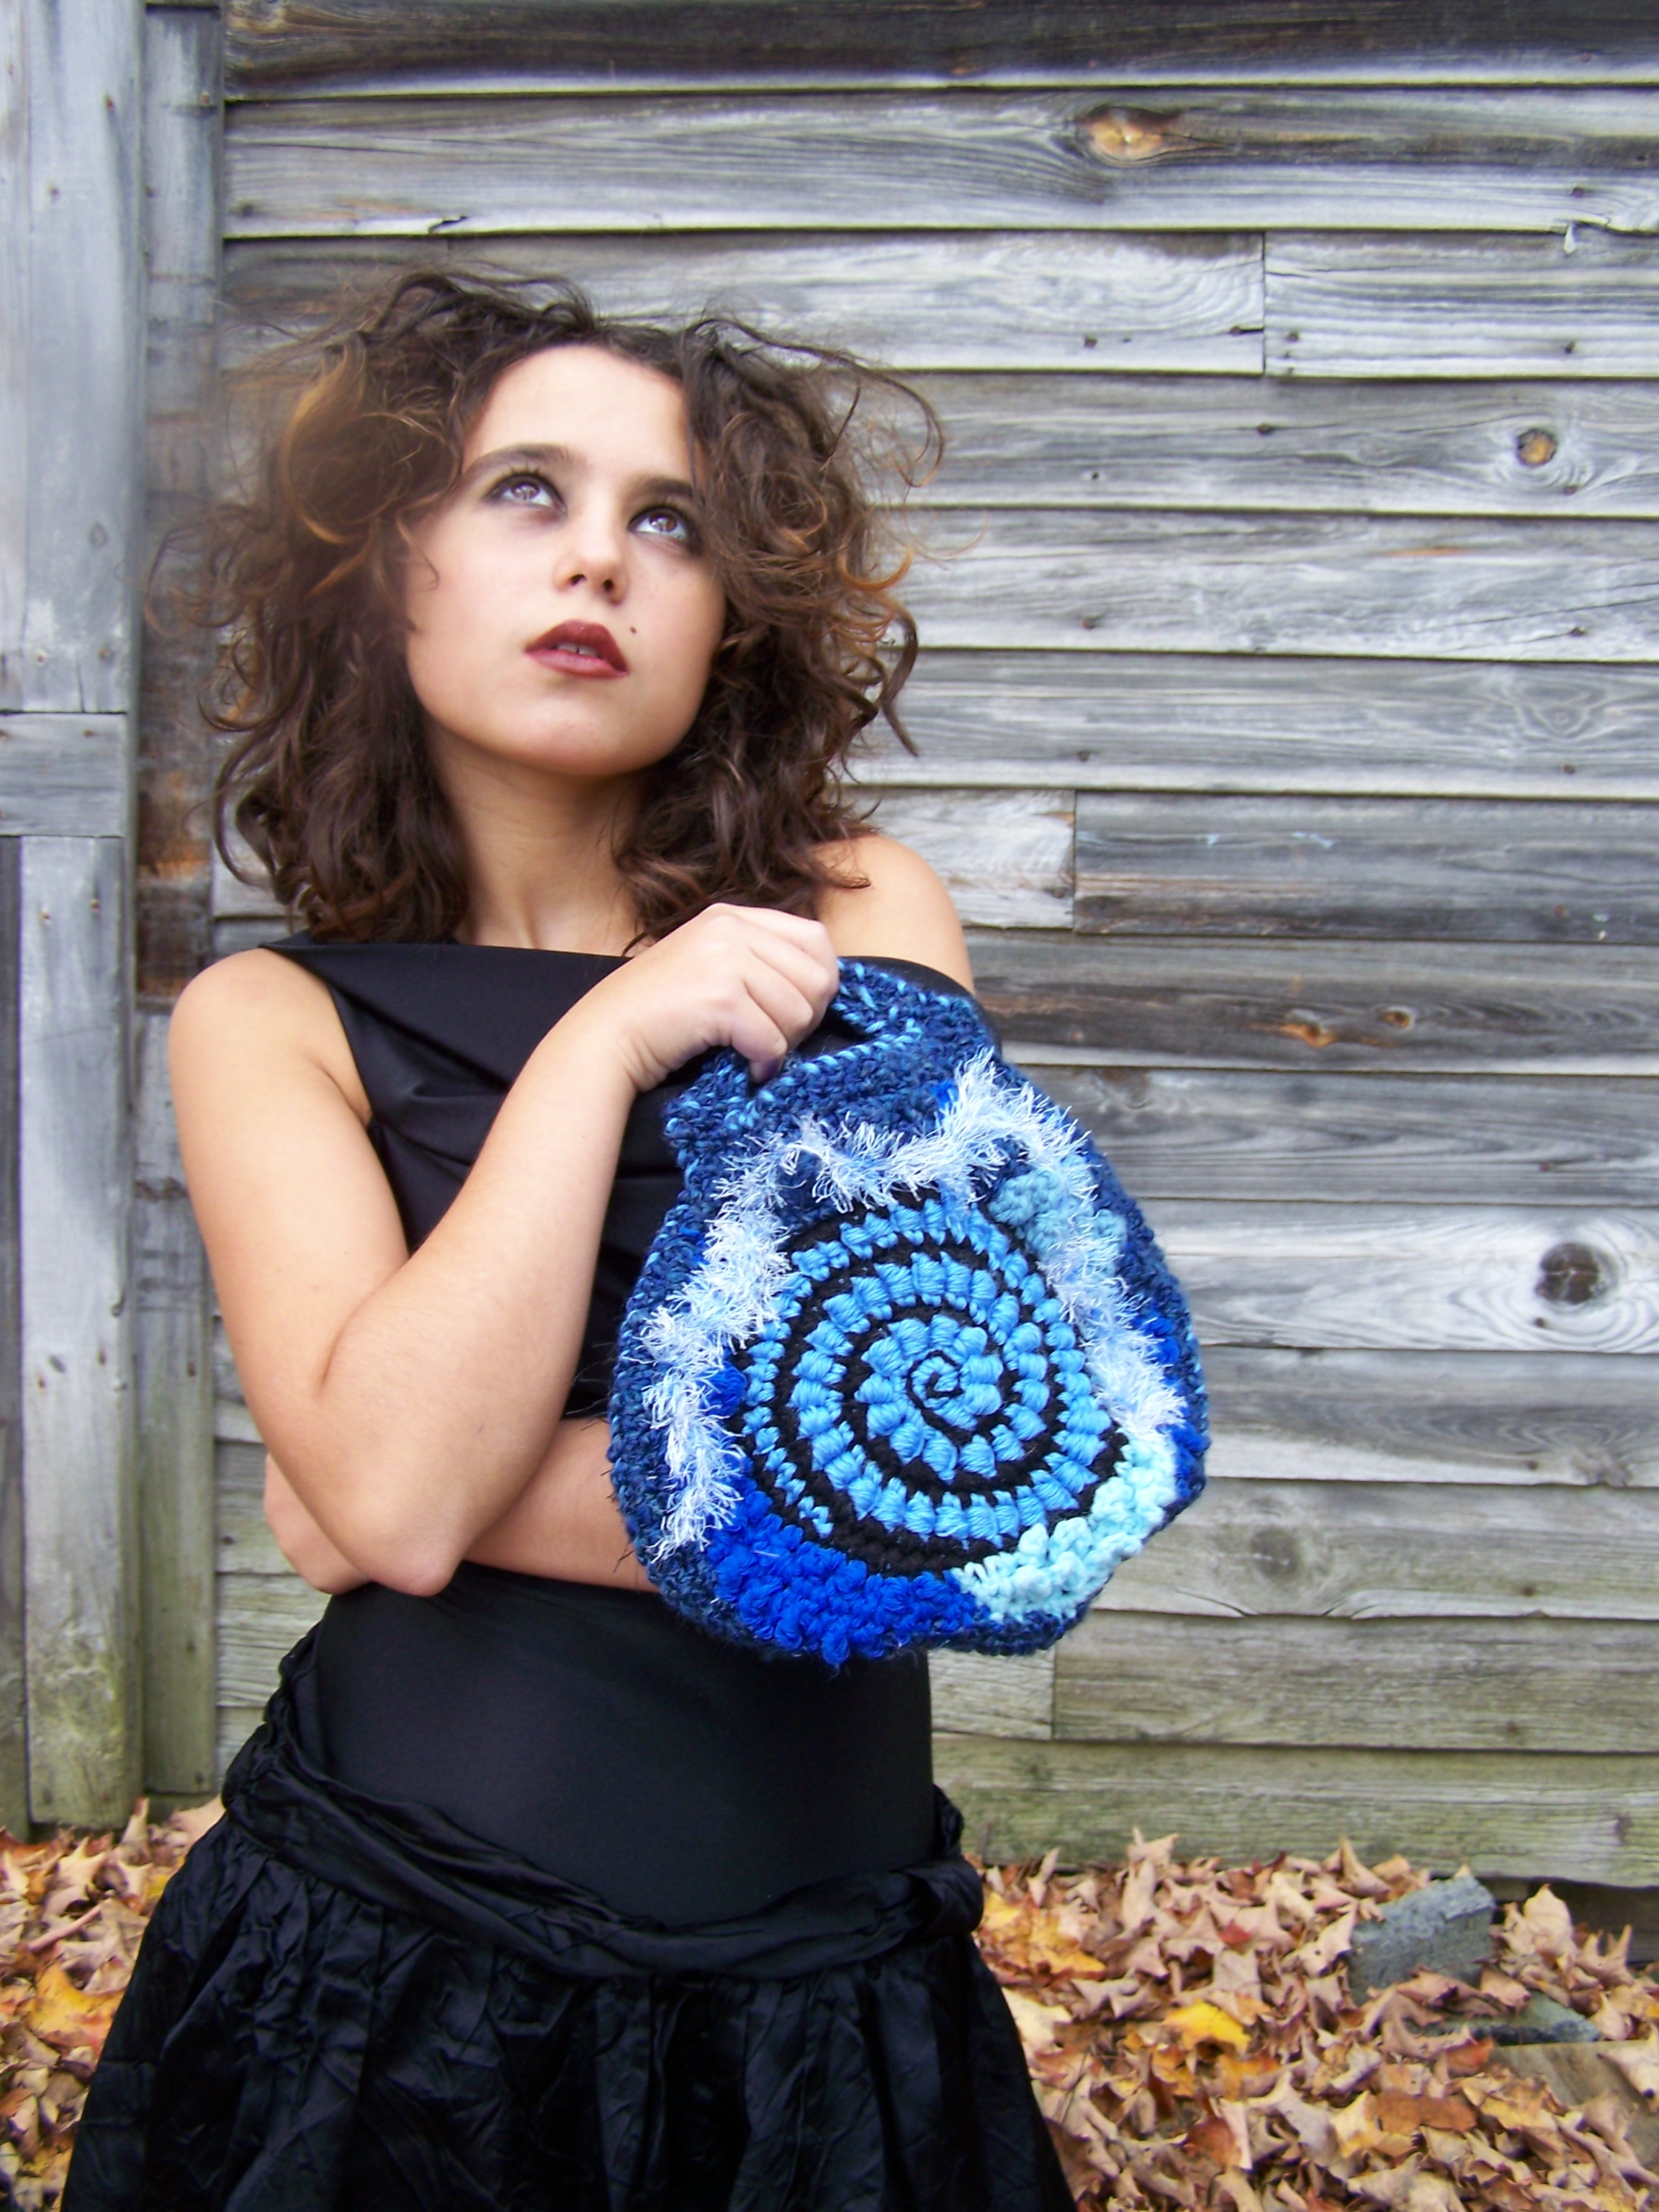 Picture of Blue Freeform Crochet Clutch